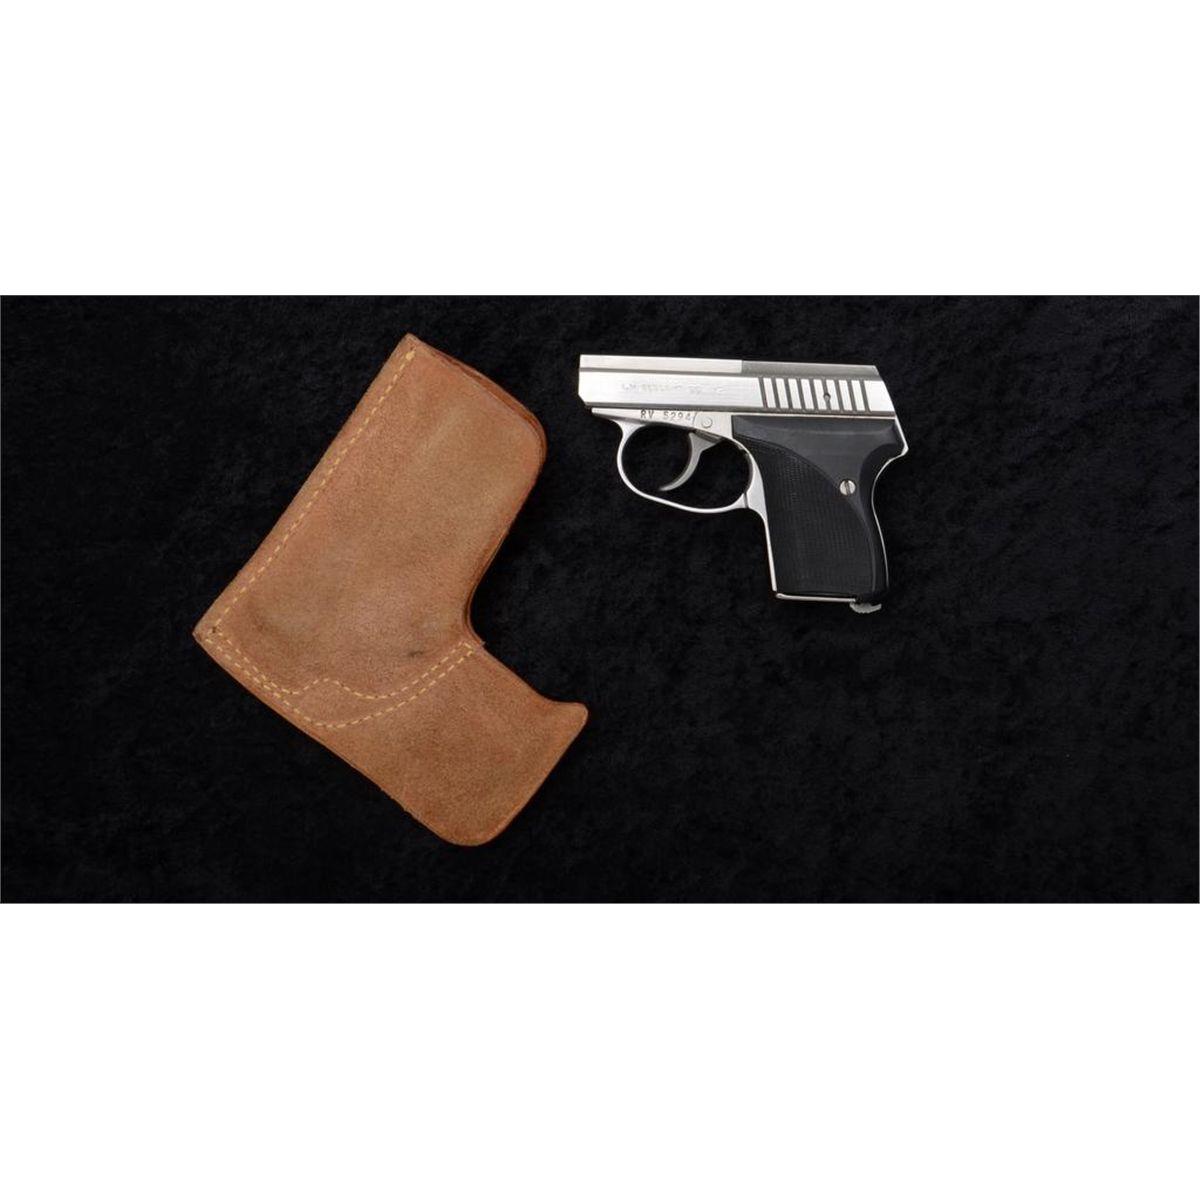 "L W  Seecamp Co  DA pocket semi-auto pistol,  32 cal , 2"" barrel, stainless  steel, checkered black"